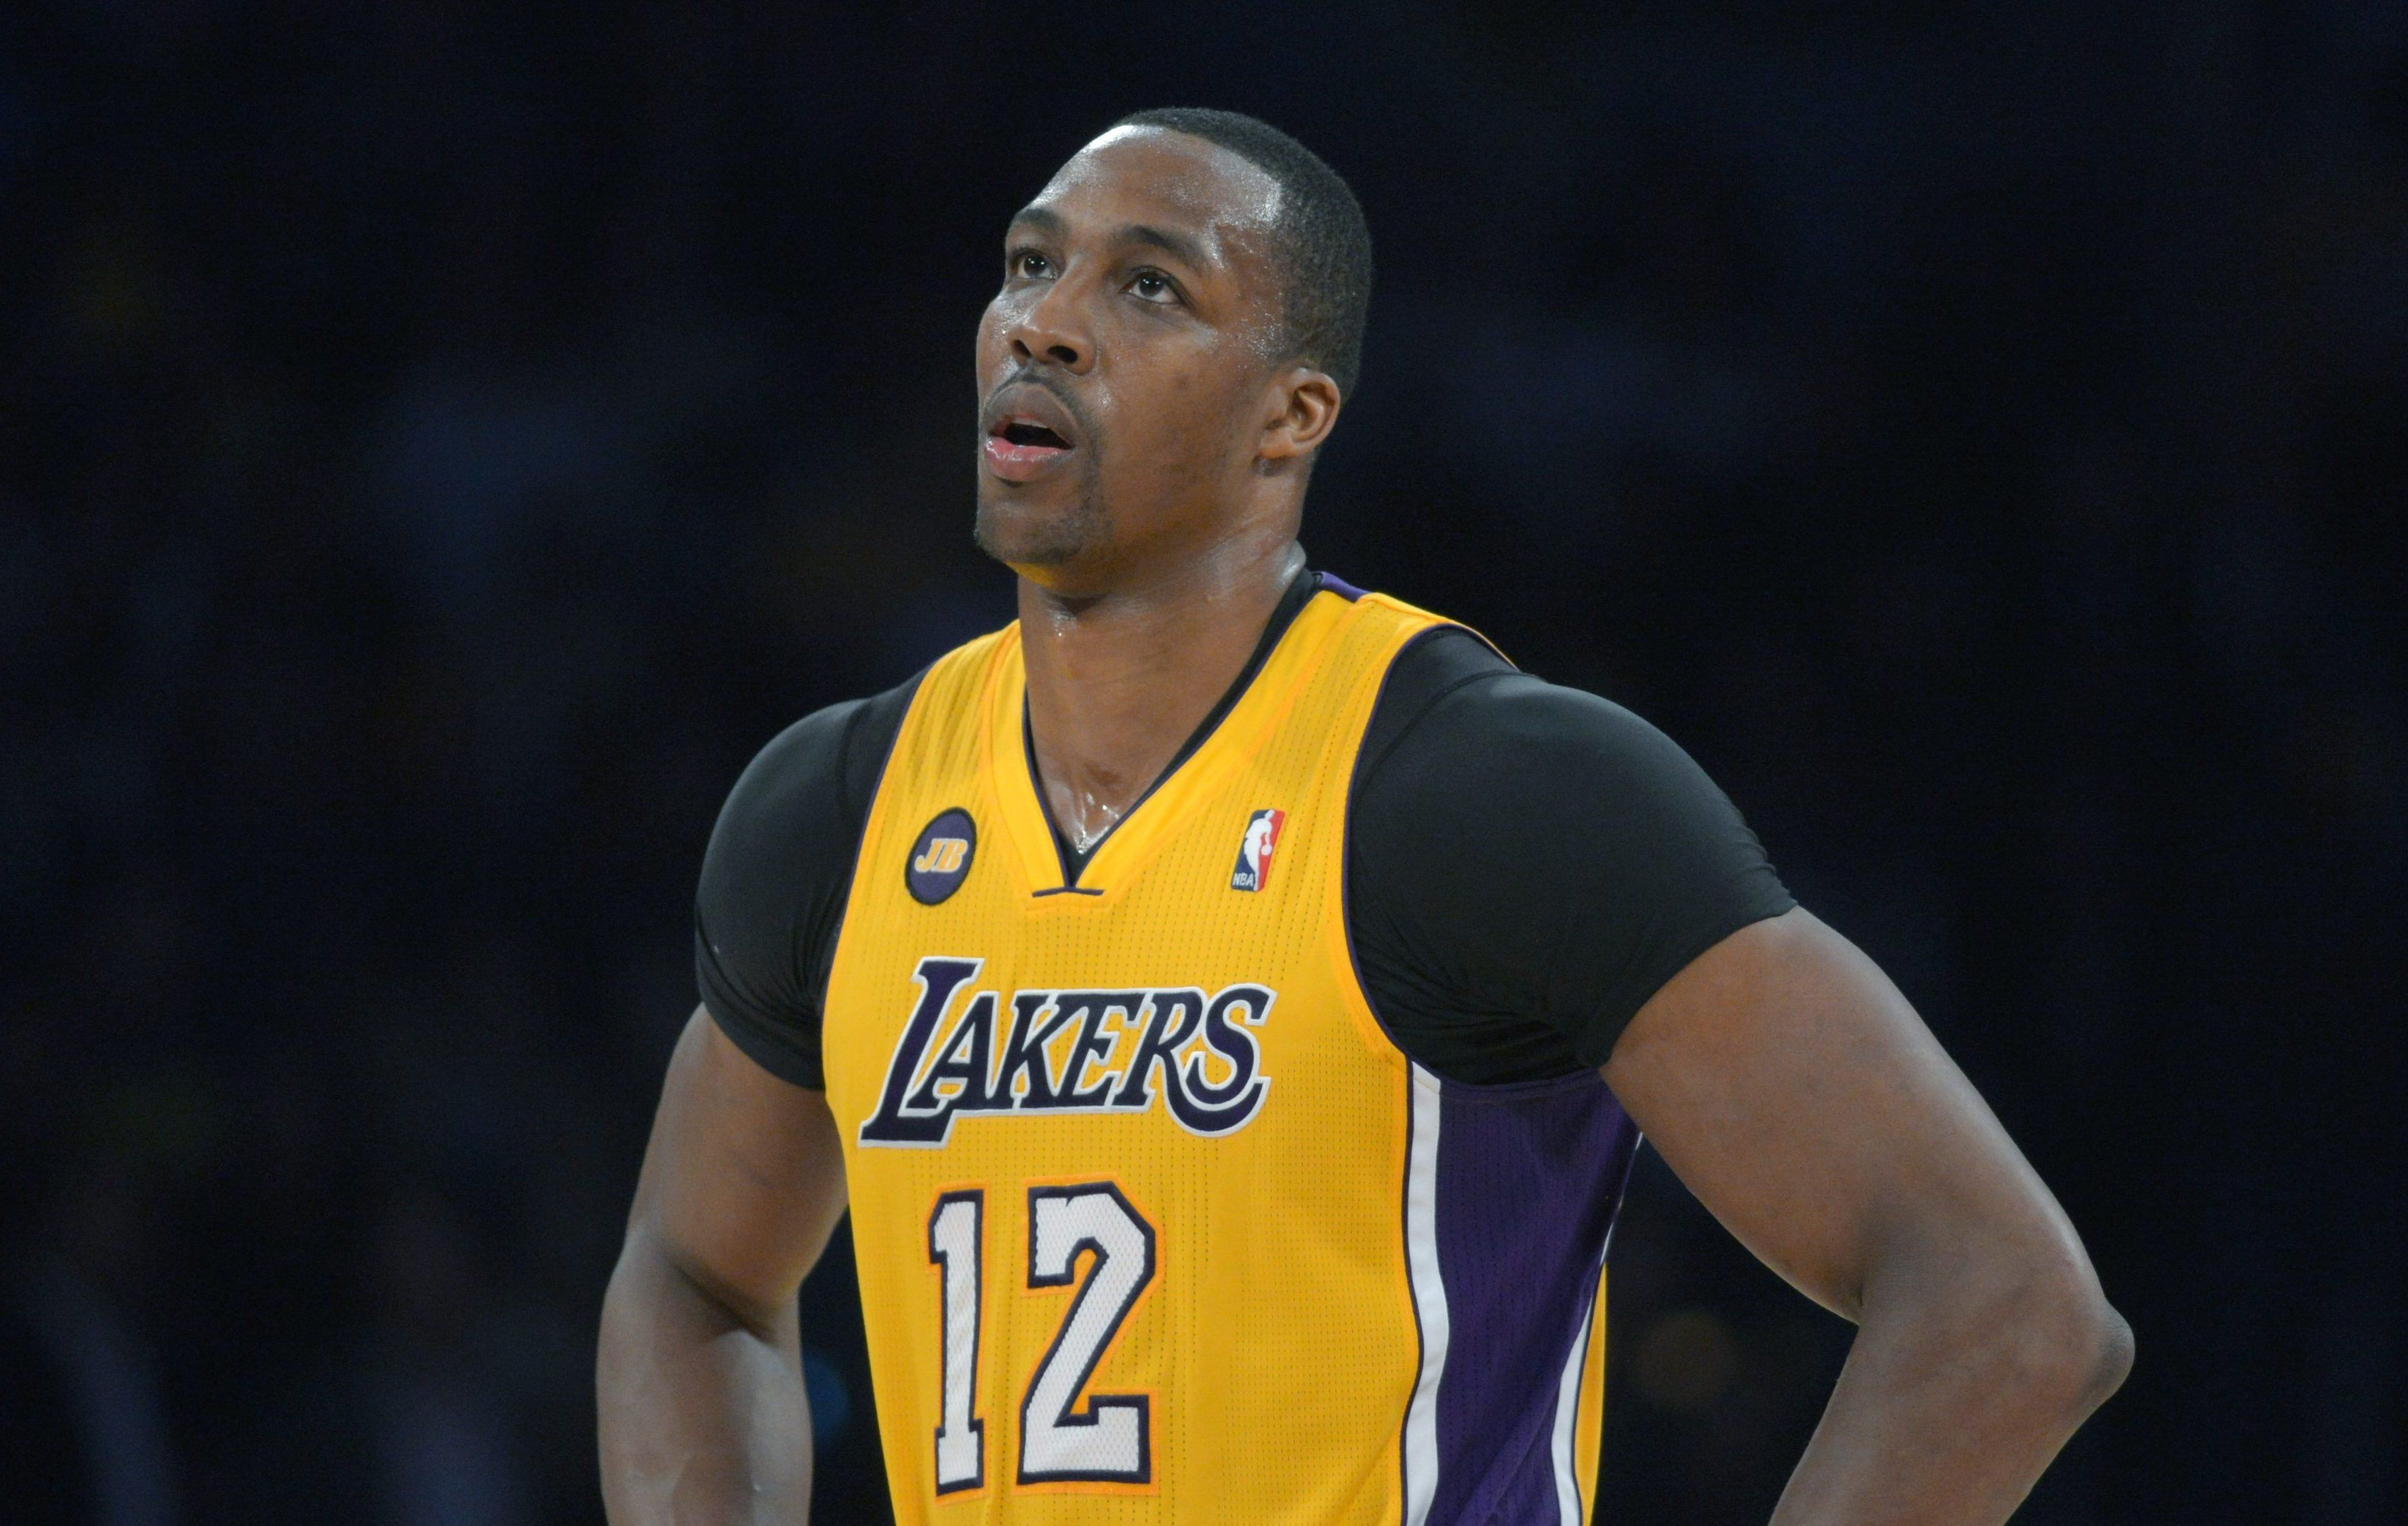 Nba Rumors La Lakers Trade List Spots In Case Dwight Howard Deal Does Not Work Out Nba Rumors